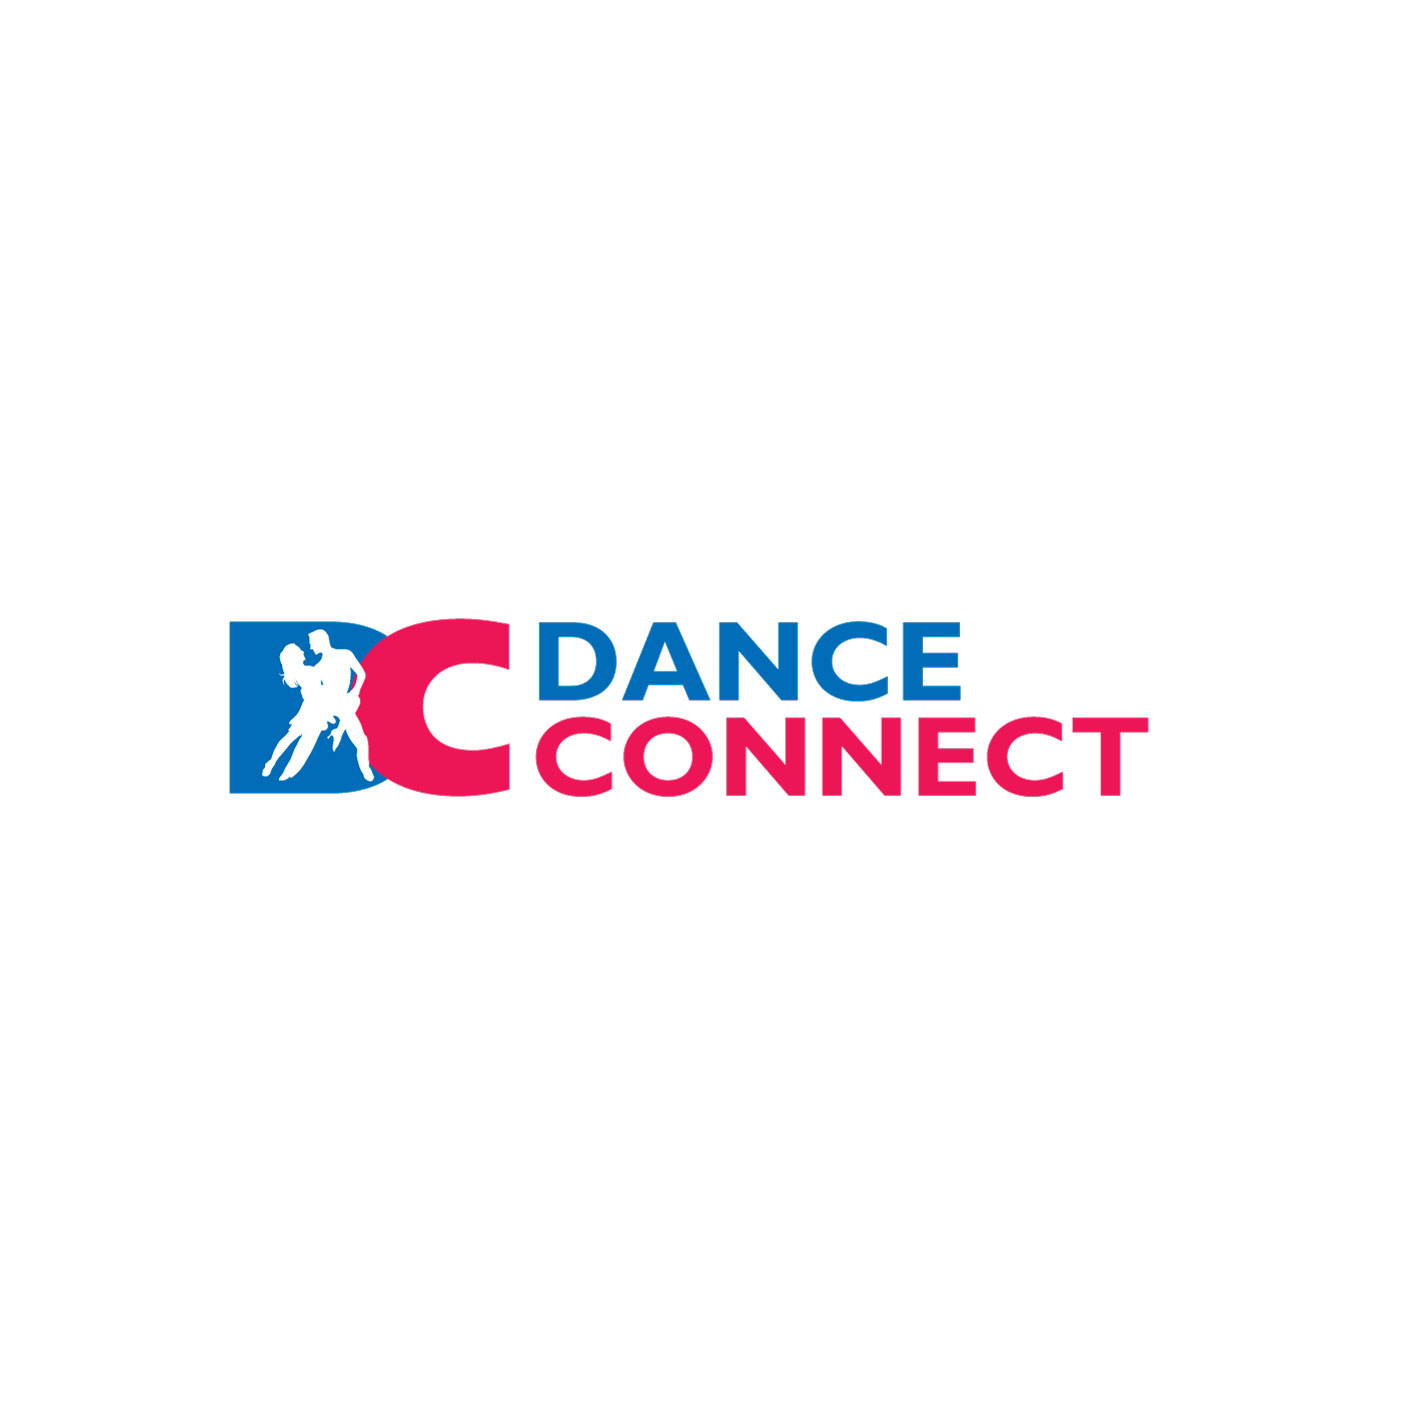 Разработка лого для спортивного портала www.danceconnect.ru фото f_9195b3f238d23e96.jpg